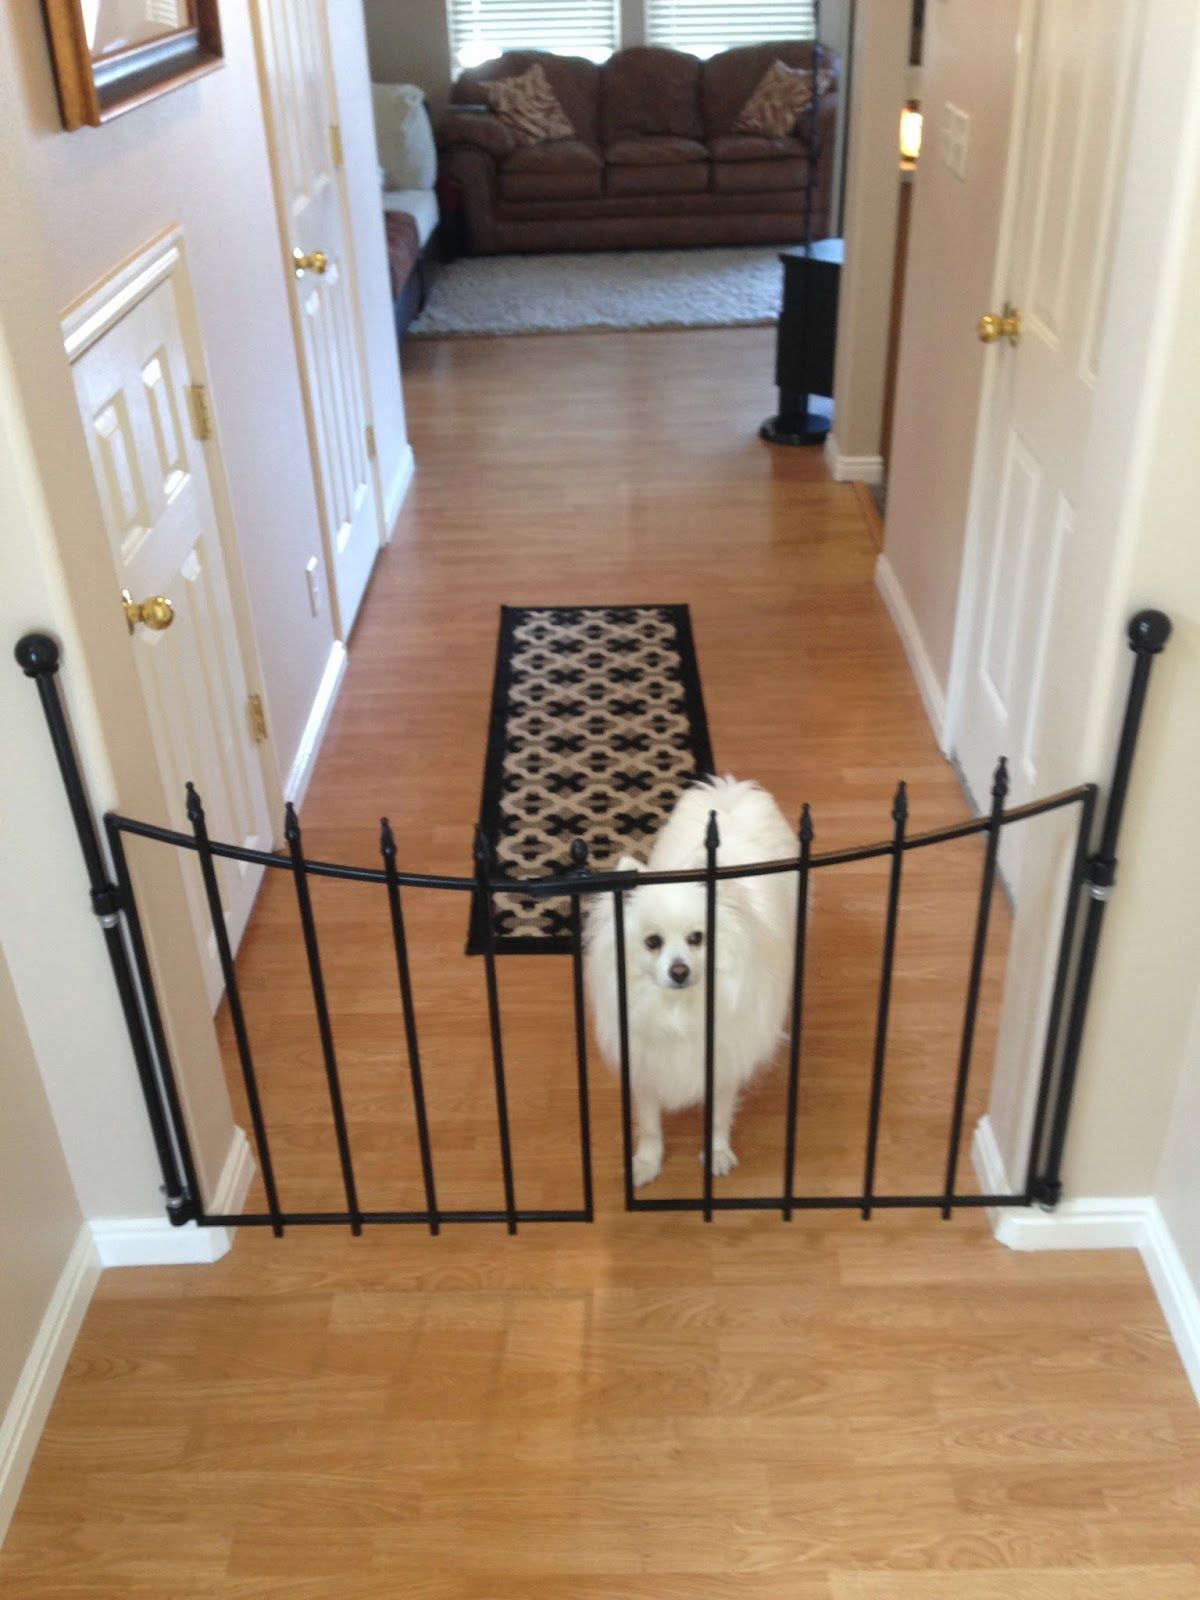 Diy Pet Gate Pet Gate Diy Dog Gate Diy Dog Bed